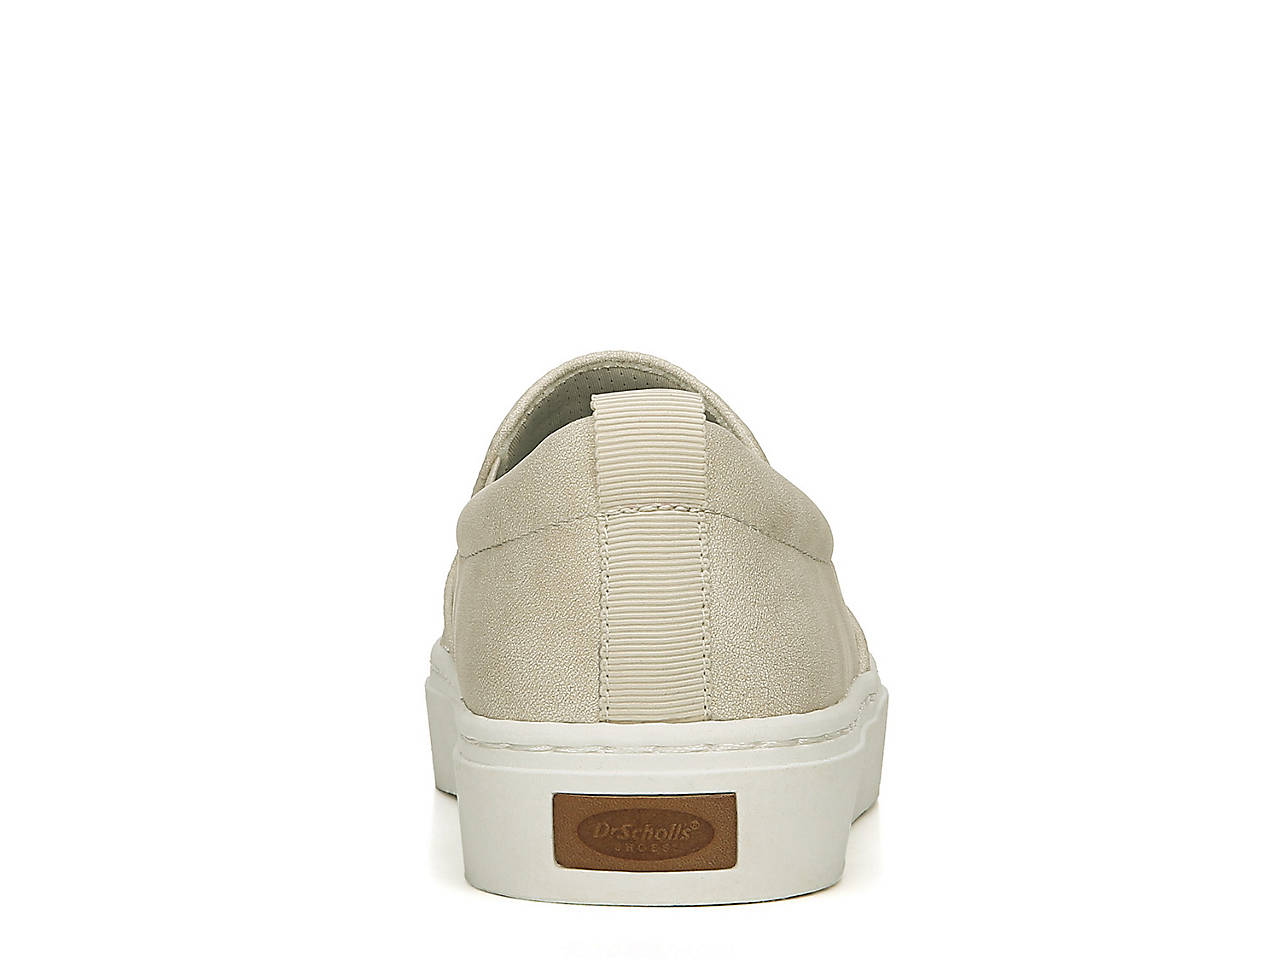 e90464ee3099 Dr. Scholl s No Bad Days Platform Slip-On Sneaker Women s Shoes